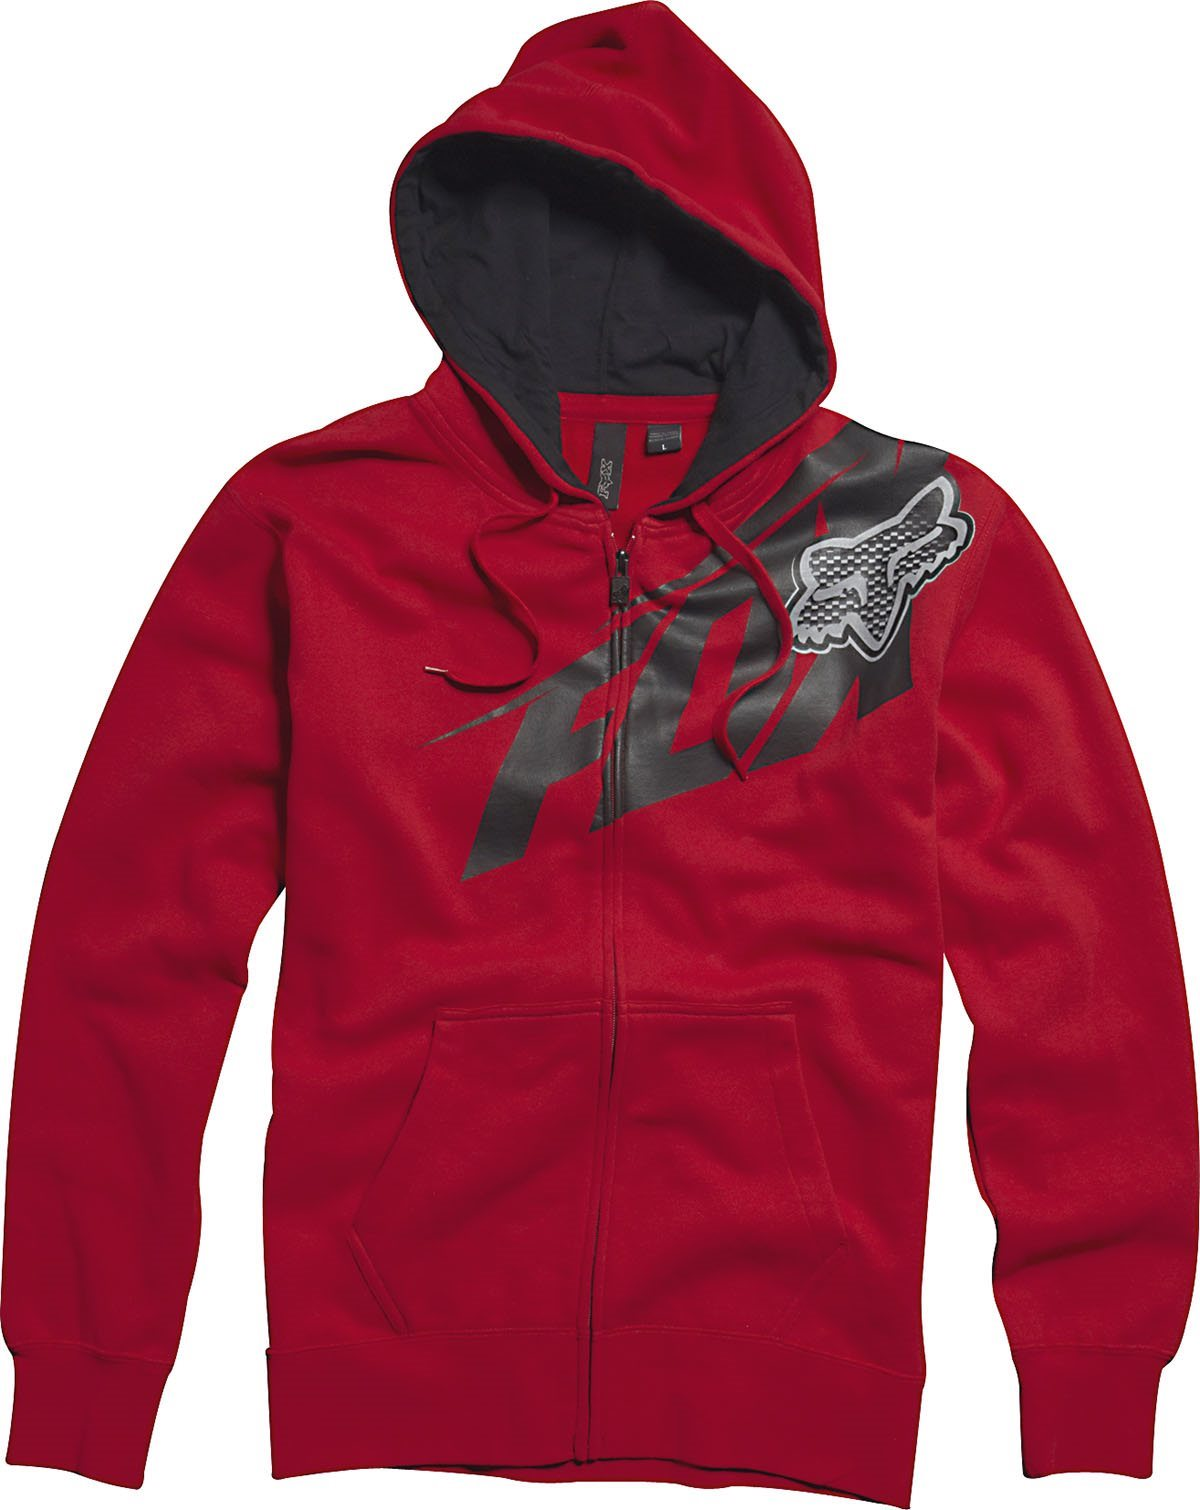 Fox pulóver Superfast piros